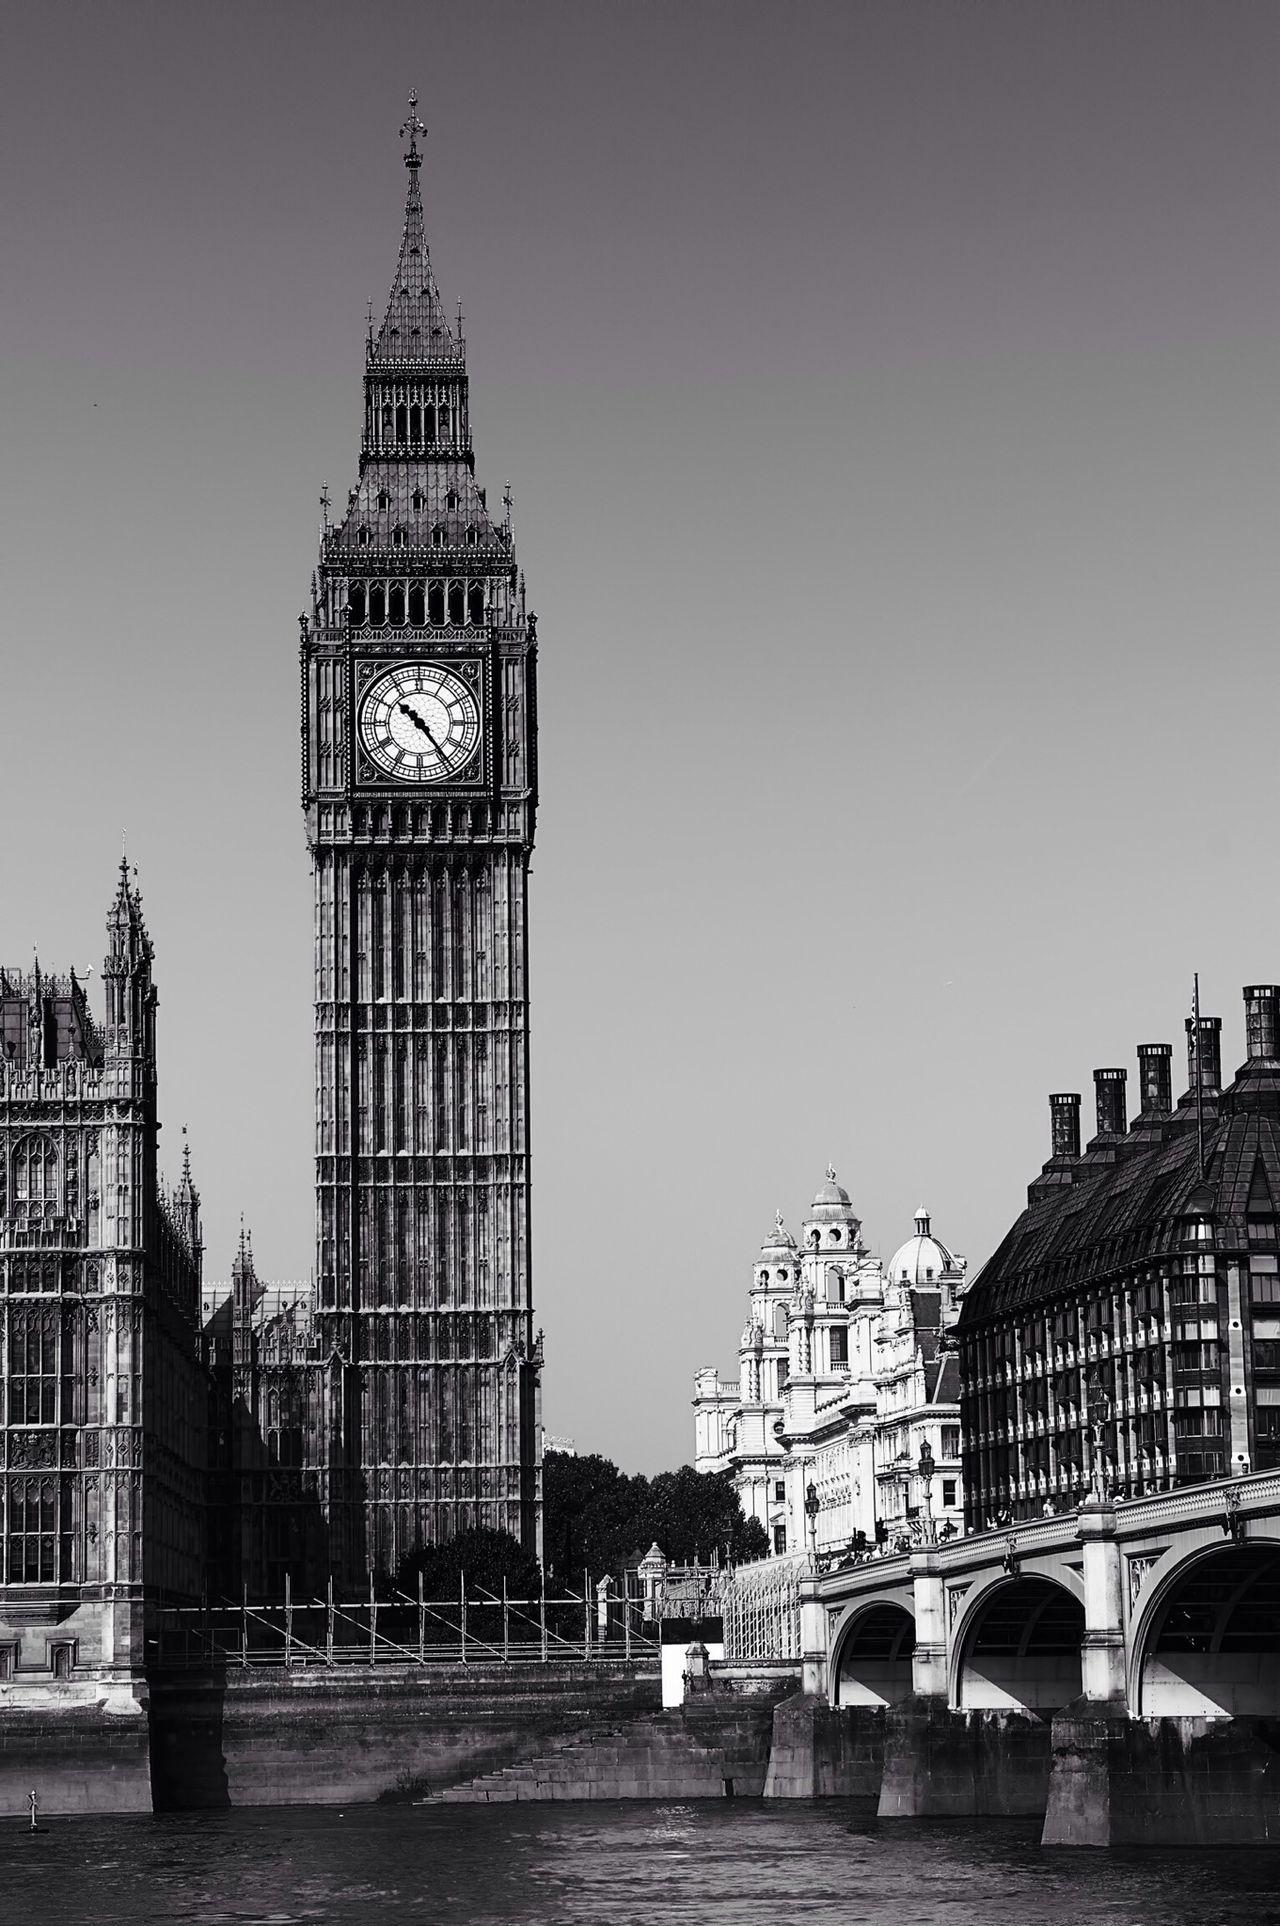 Big Ben London Black And White Monochrome Architecture Battle Of The Cities Thames EyeEm Best Shots - Black + White Black & White Fine Art Bridge Blackandwhite Famous Place Landmark England